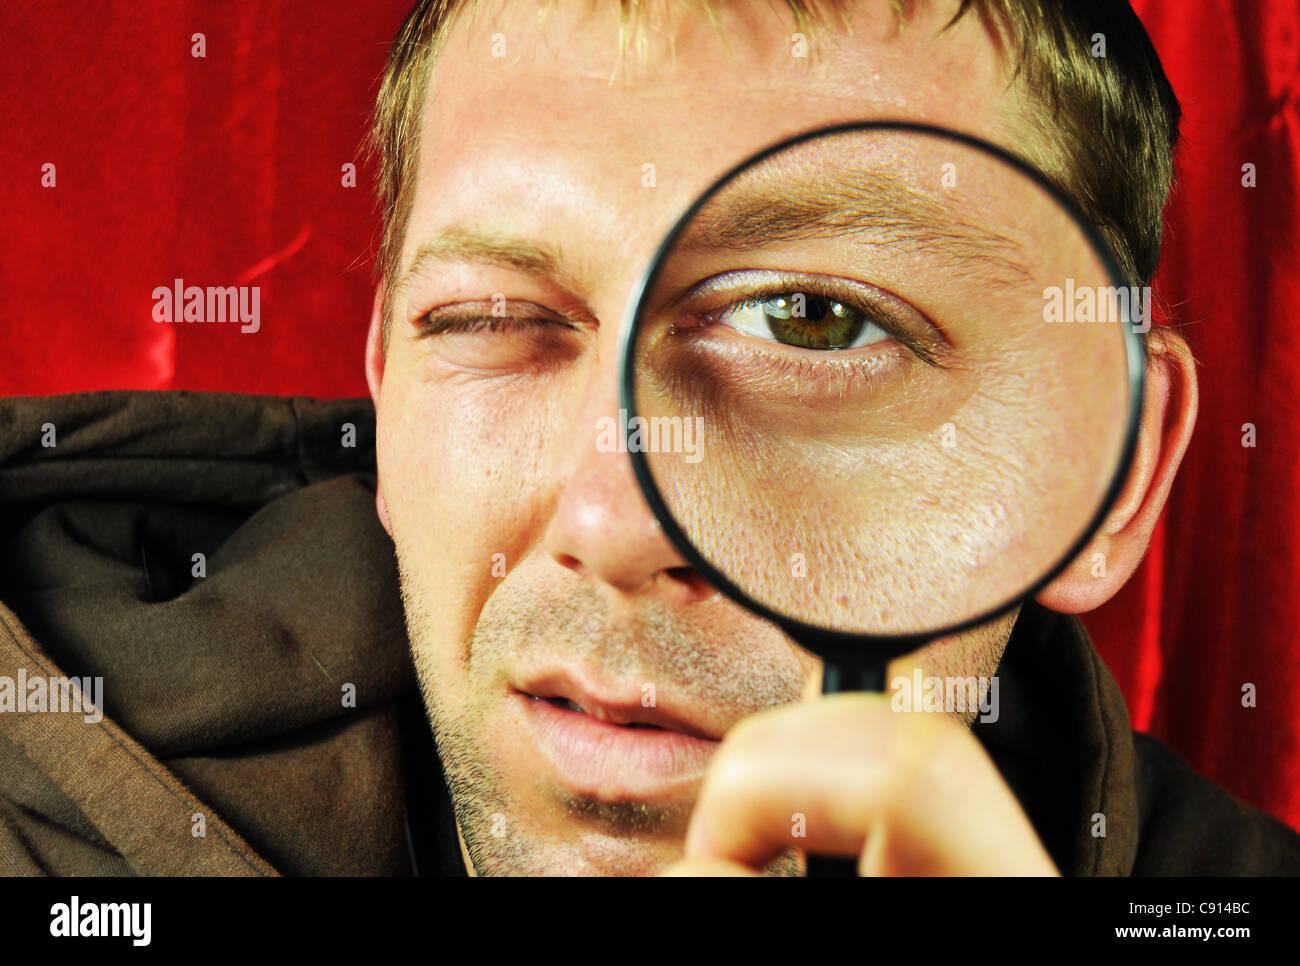 Concepto de búsqueda Imagen De Stock